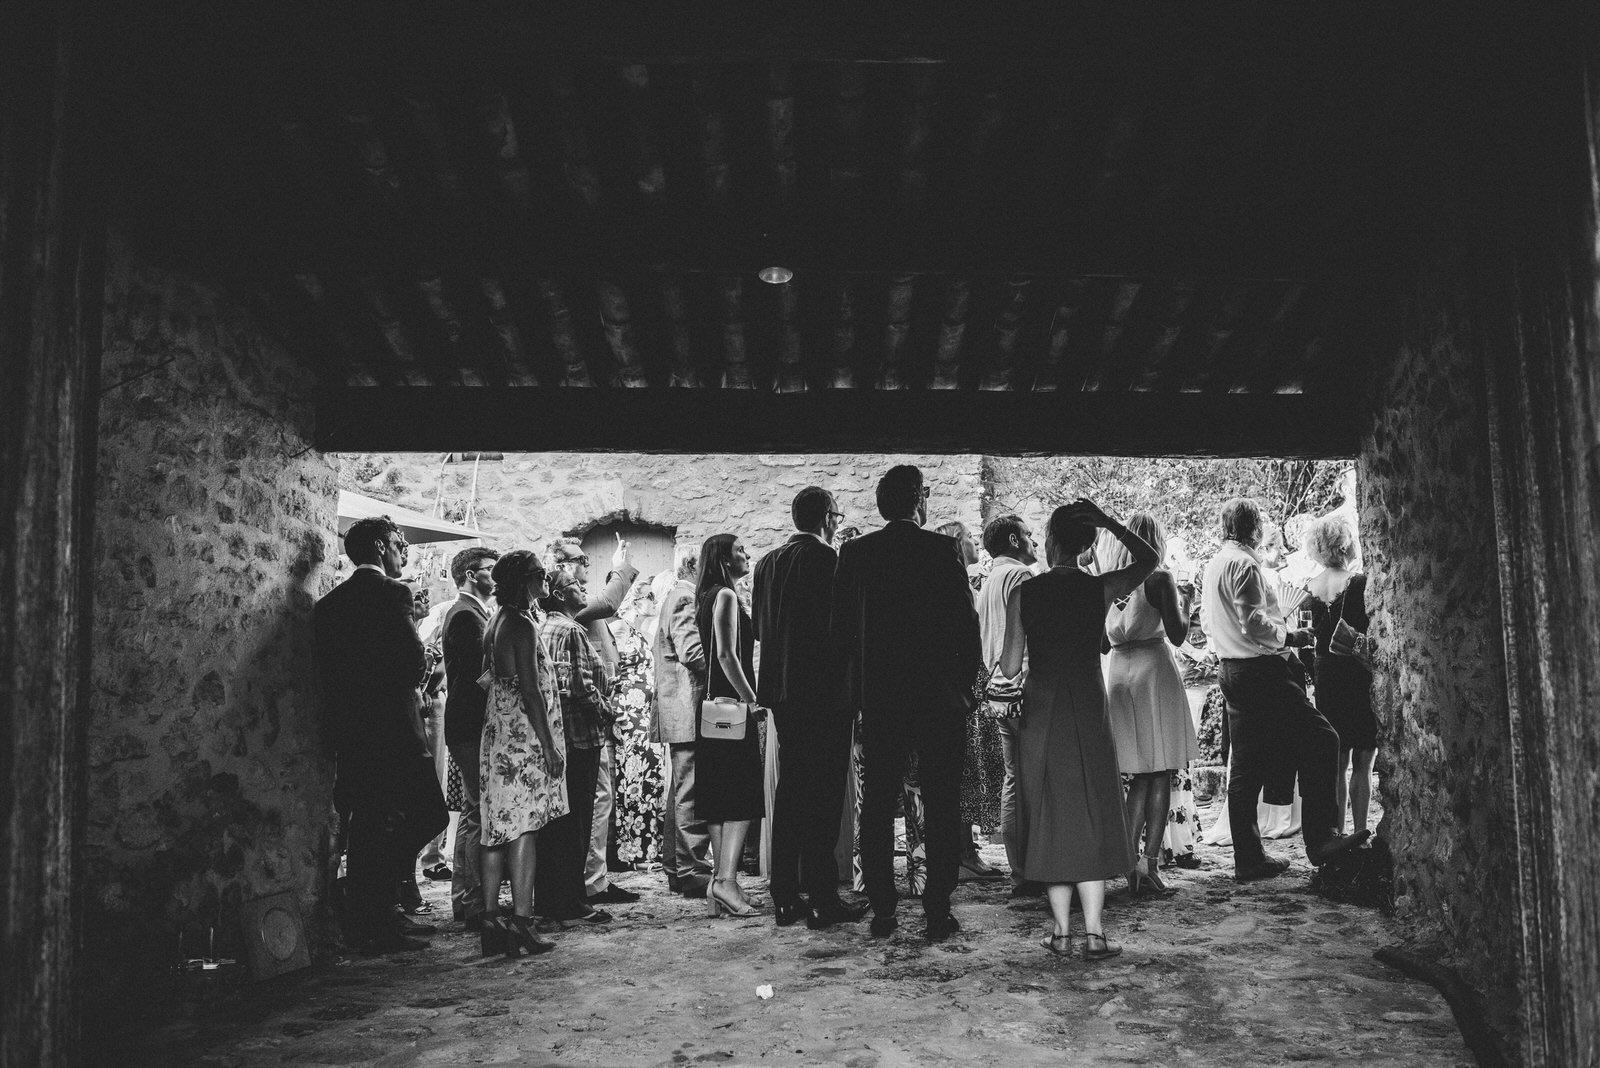 024-LOURMARIN-WEDDING-PHOTOGRAPHER-PROVENCE-WEDDING-ALTERNATIVE-WEDDING-PHOTOGRAPHY-FRANCE-PROVENCE-GARDEN-WEDDING.JPG